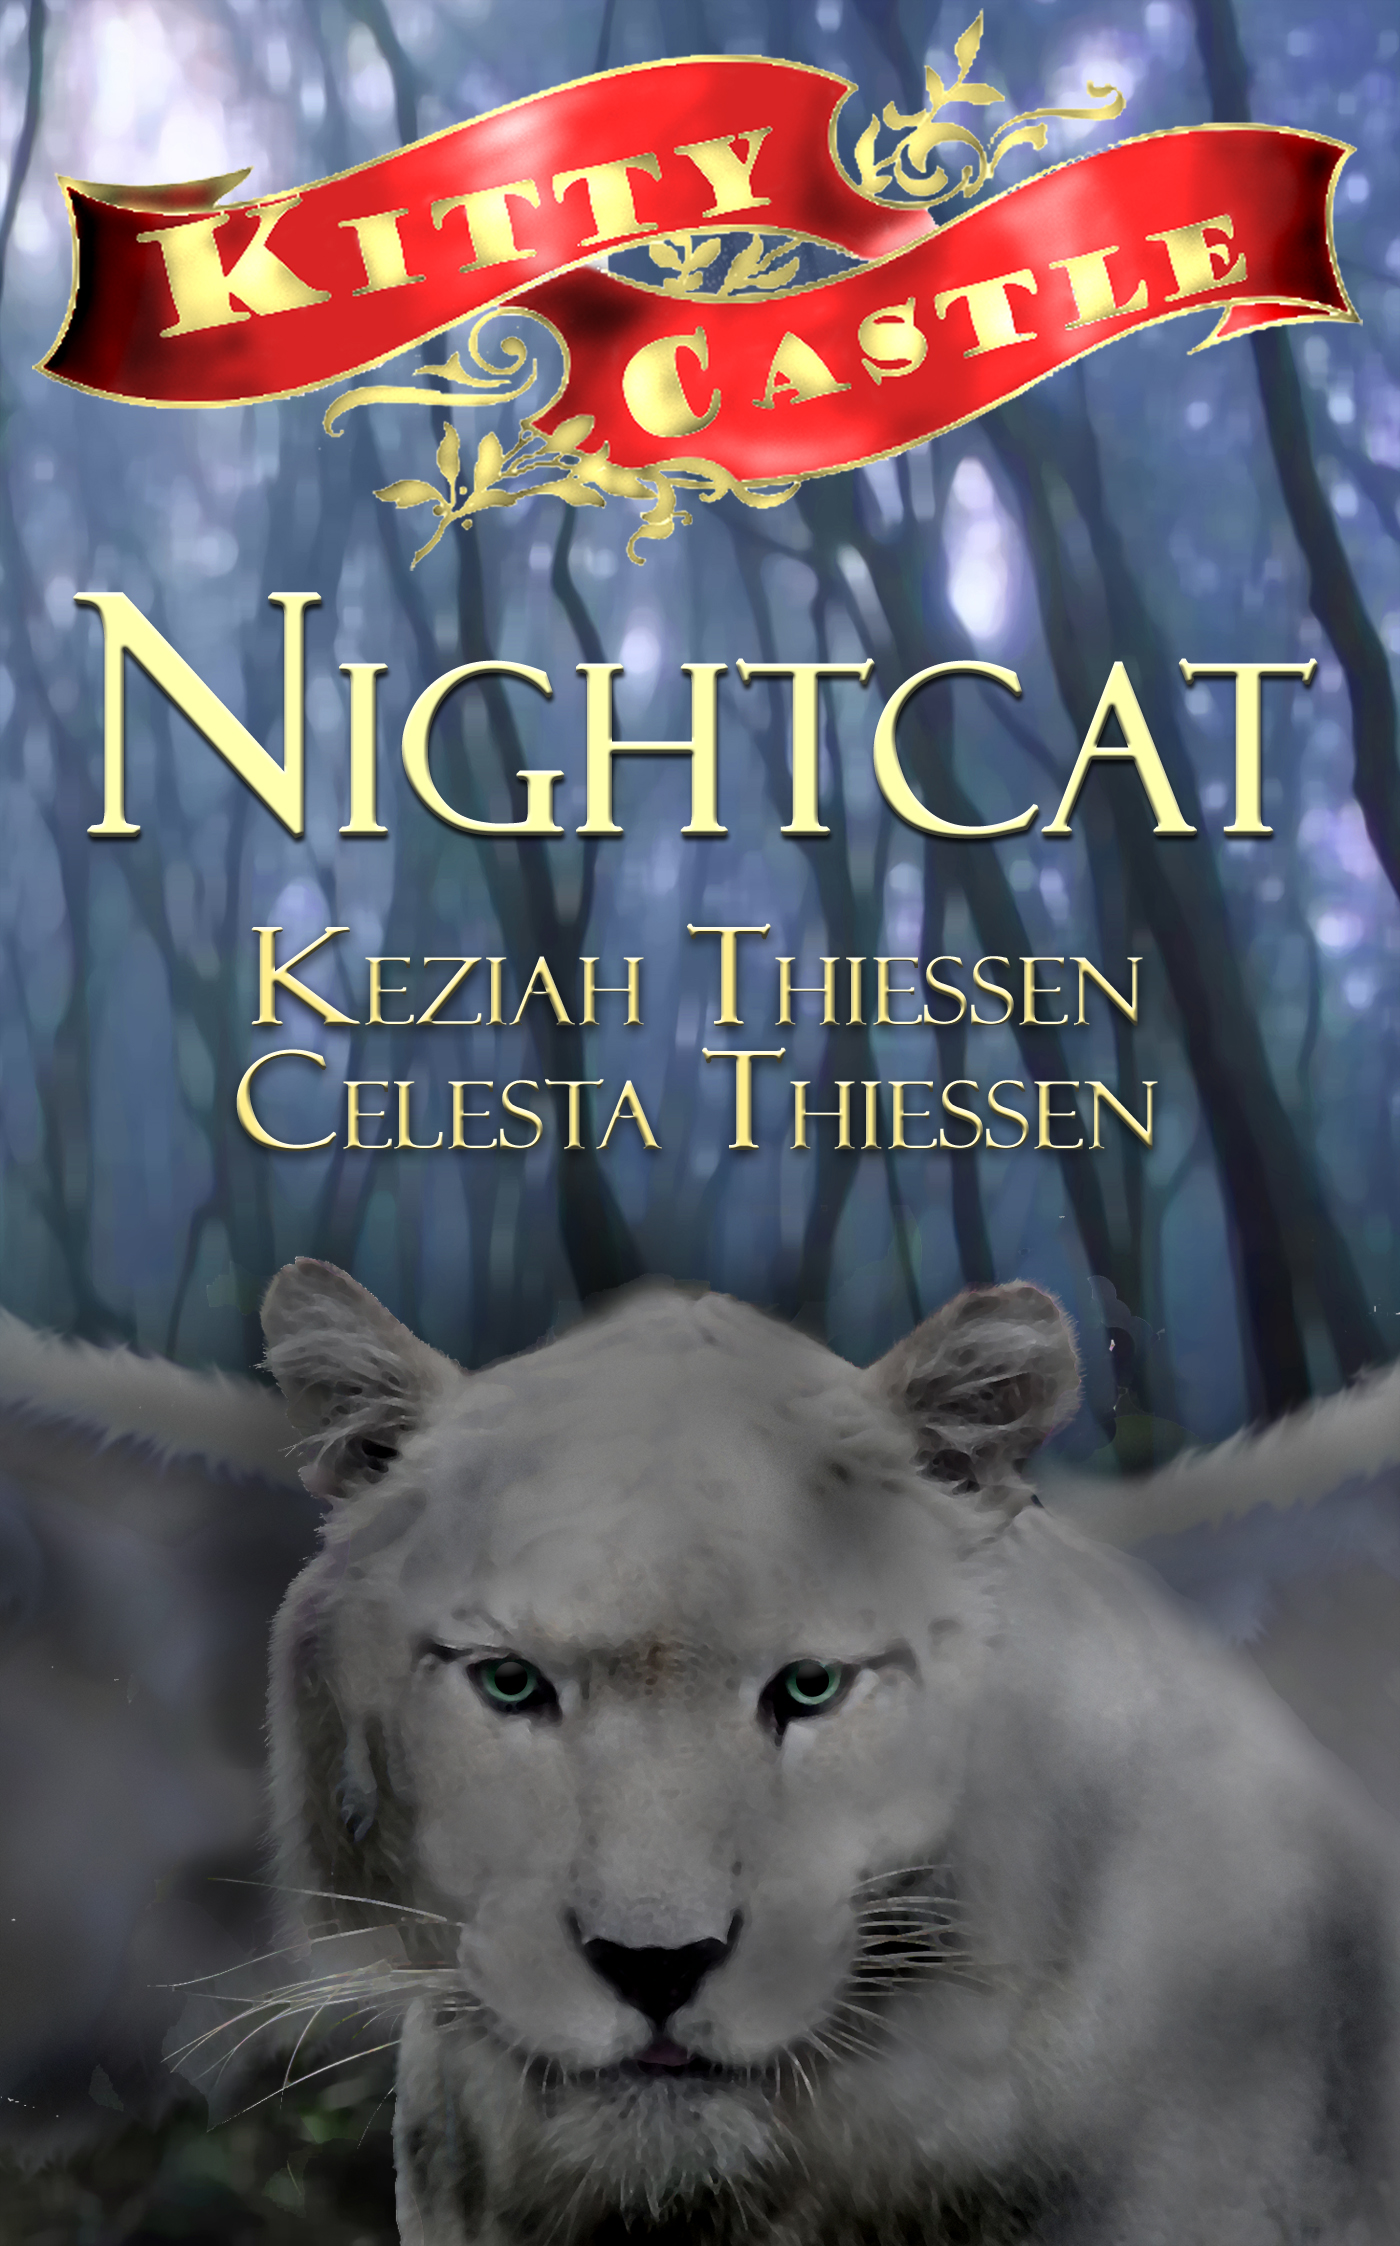 Nightcat (sst-ccclxii)